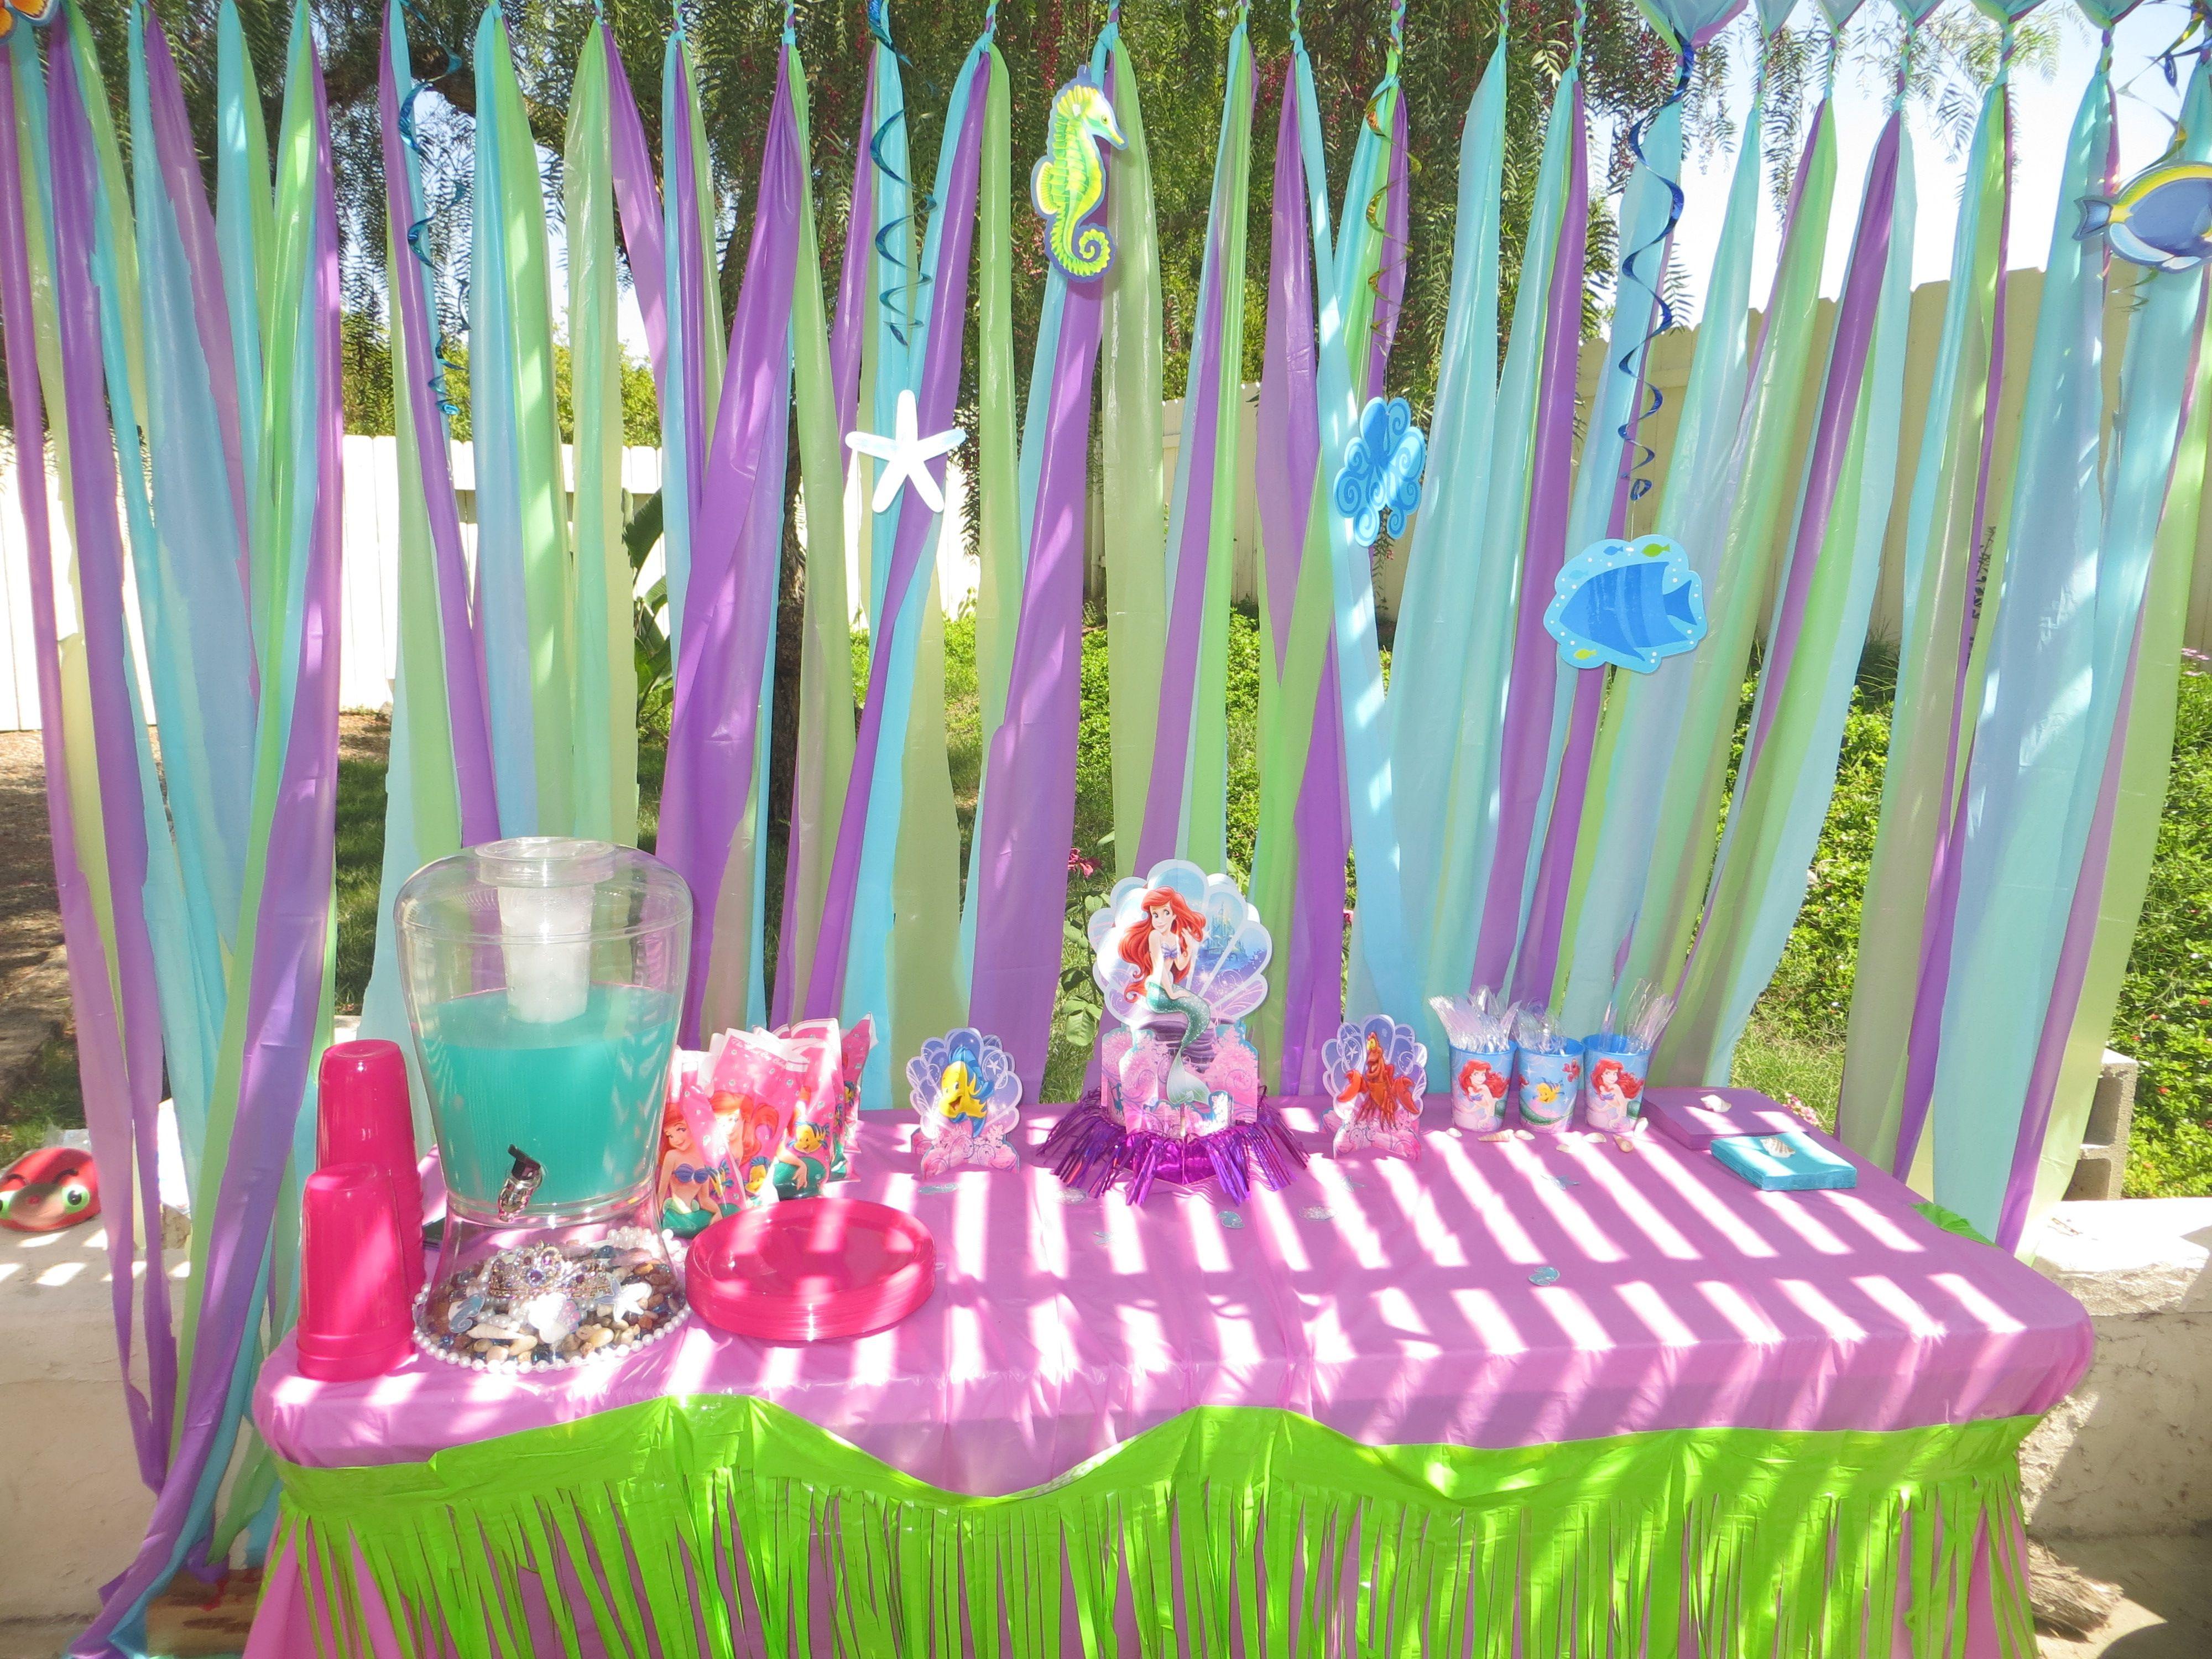 Little Mermaid Party Decoration Ideas  Arianna s 3rd birthday party decorations The little